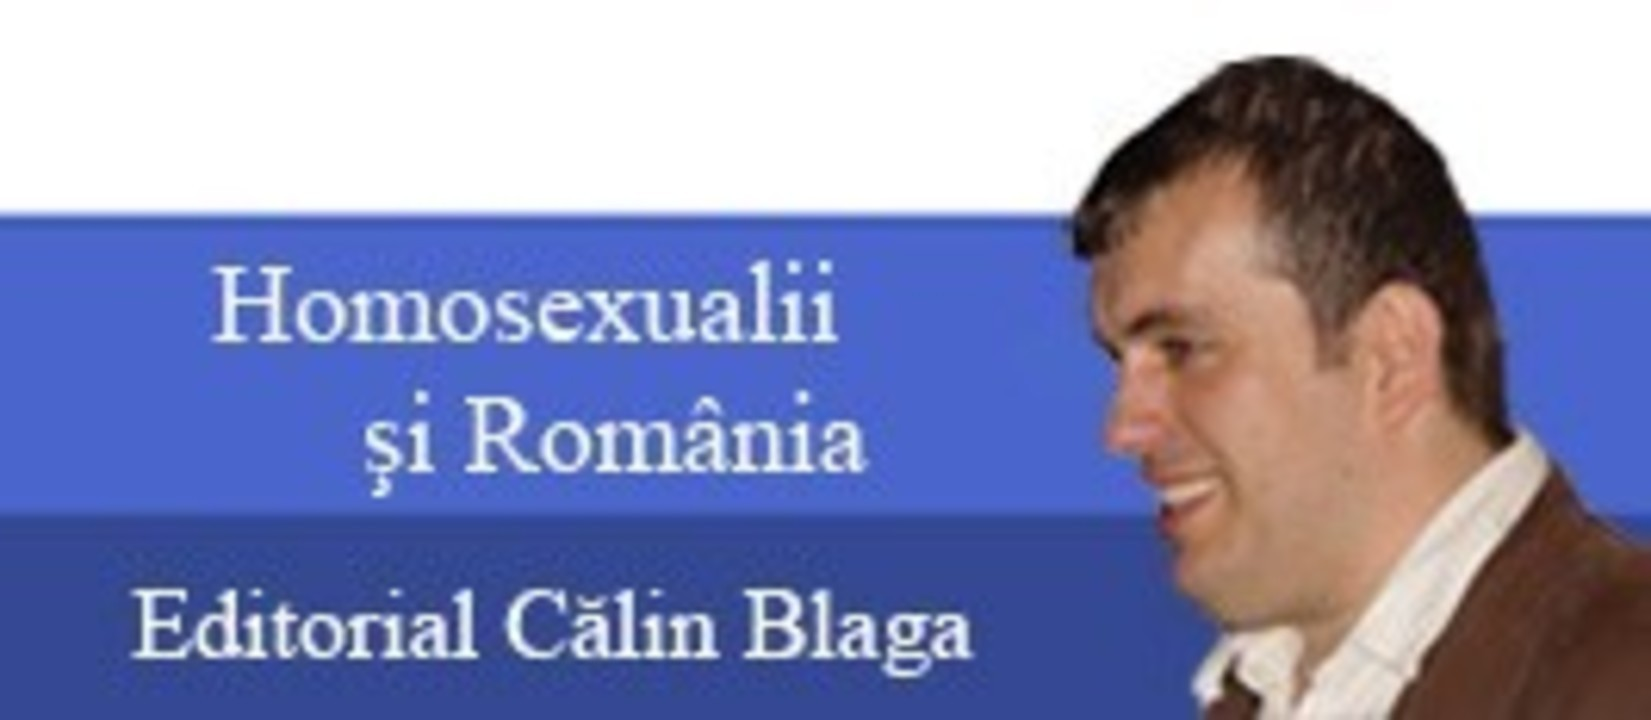 Homosexualii si Romania